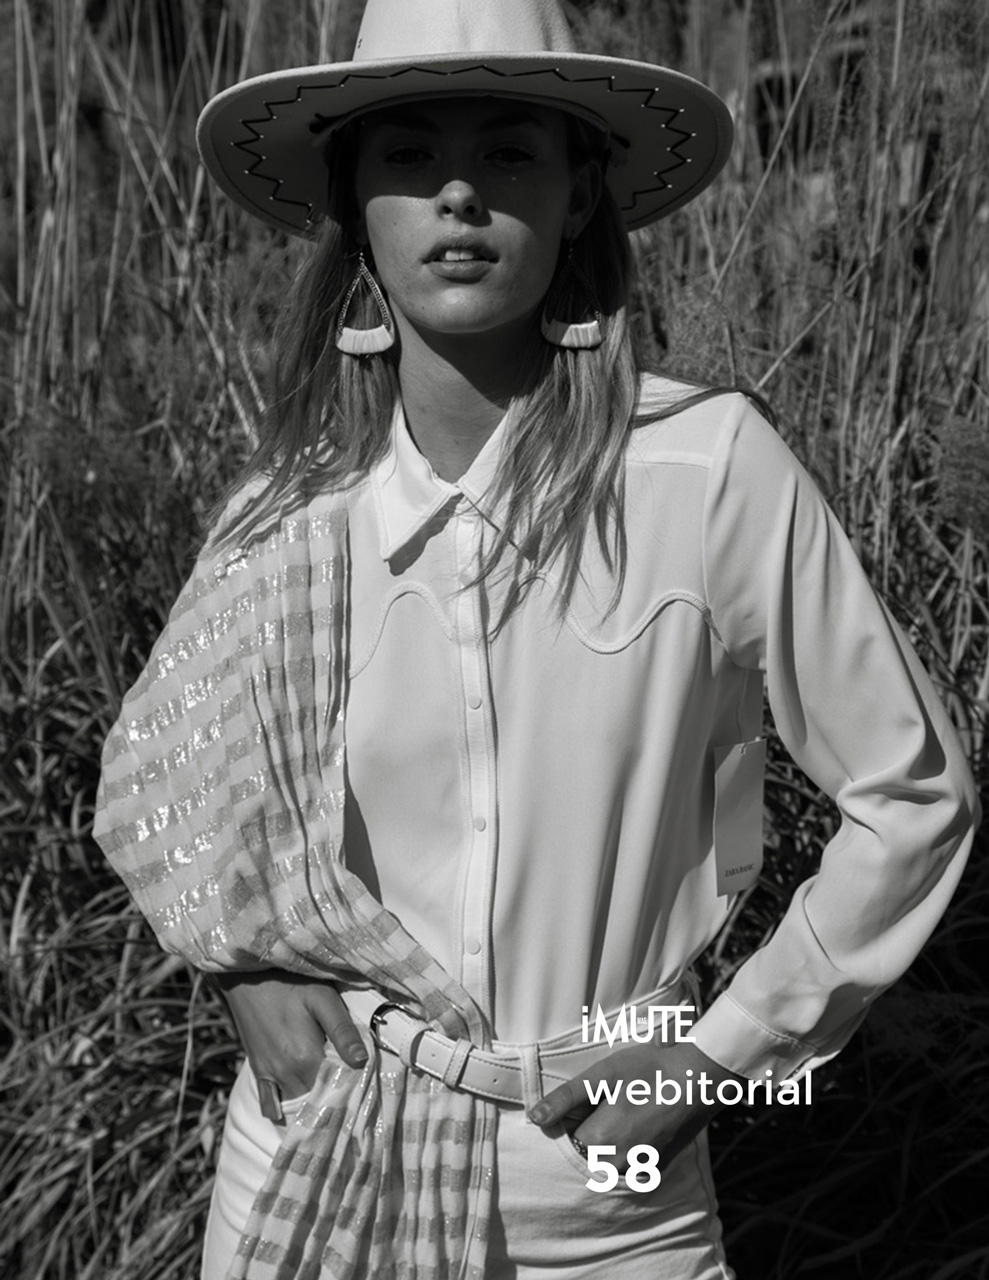 Sophie webitorial for iMute Magazine Photographer   Selim Soysal Model   Sophie @ Blow Models Stylist   Carolina Levesque Makeup & Hair   Maria Angela Sanchez Pagan